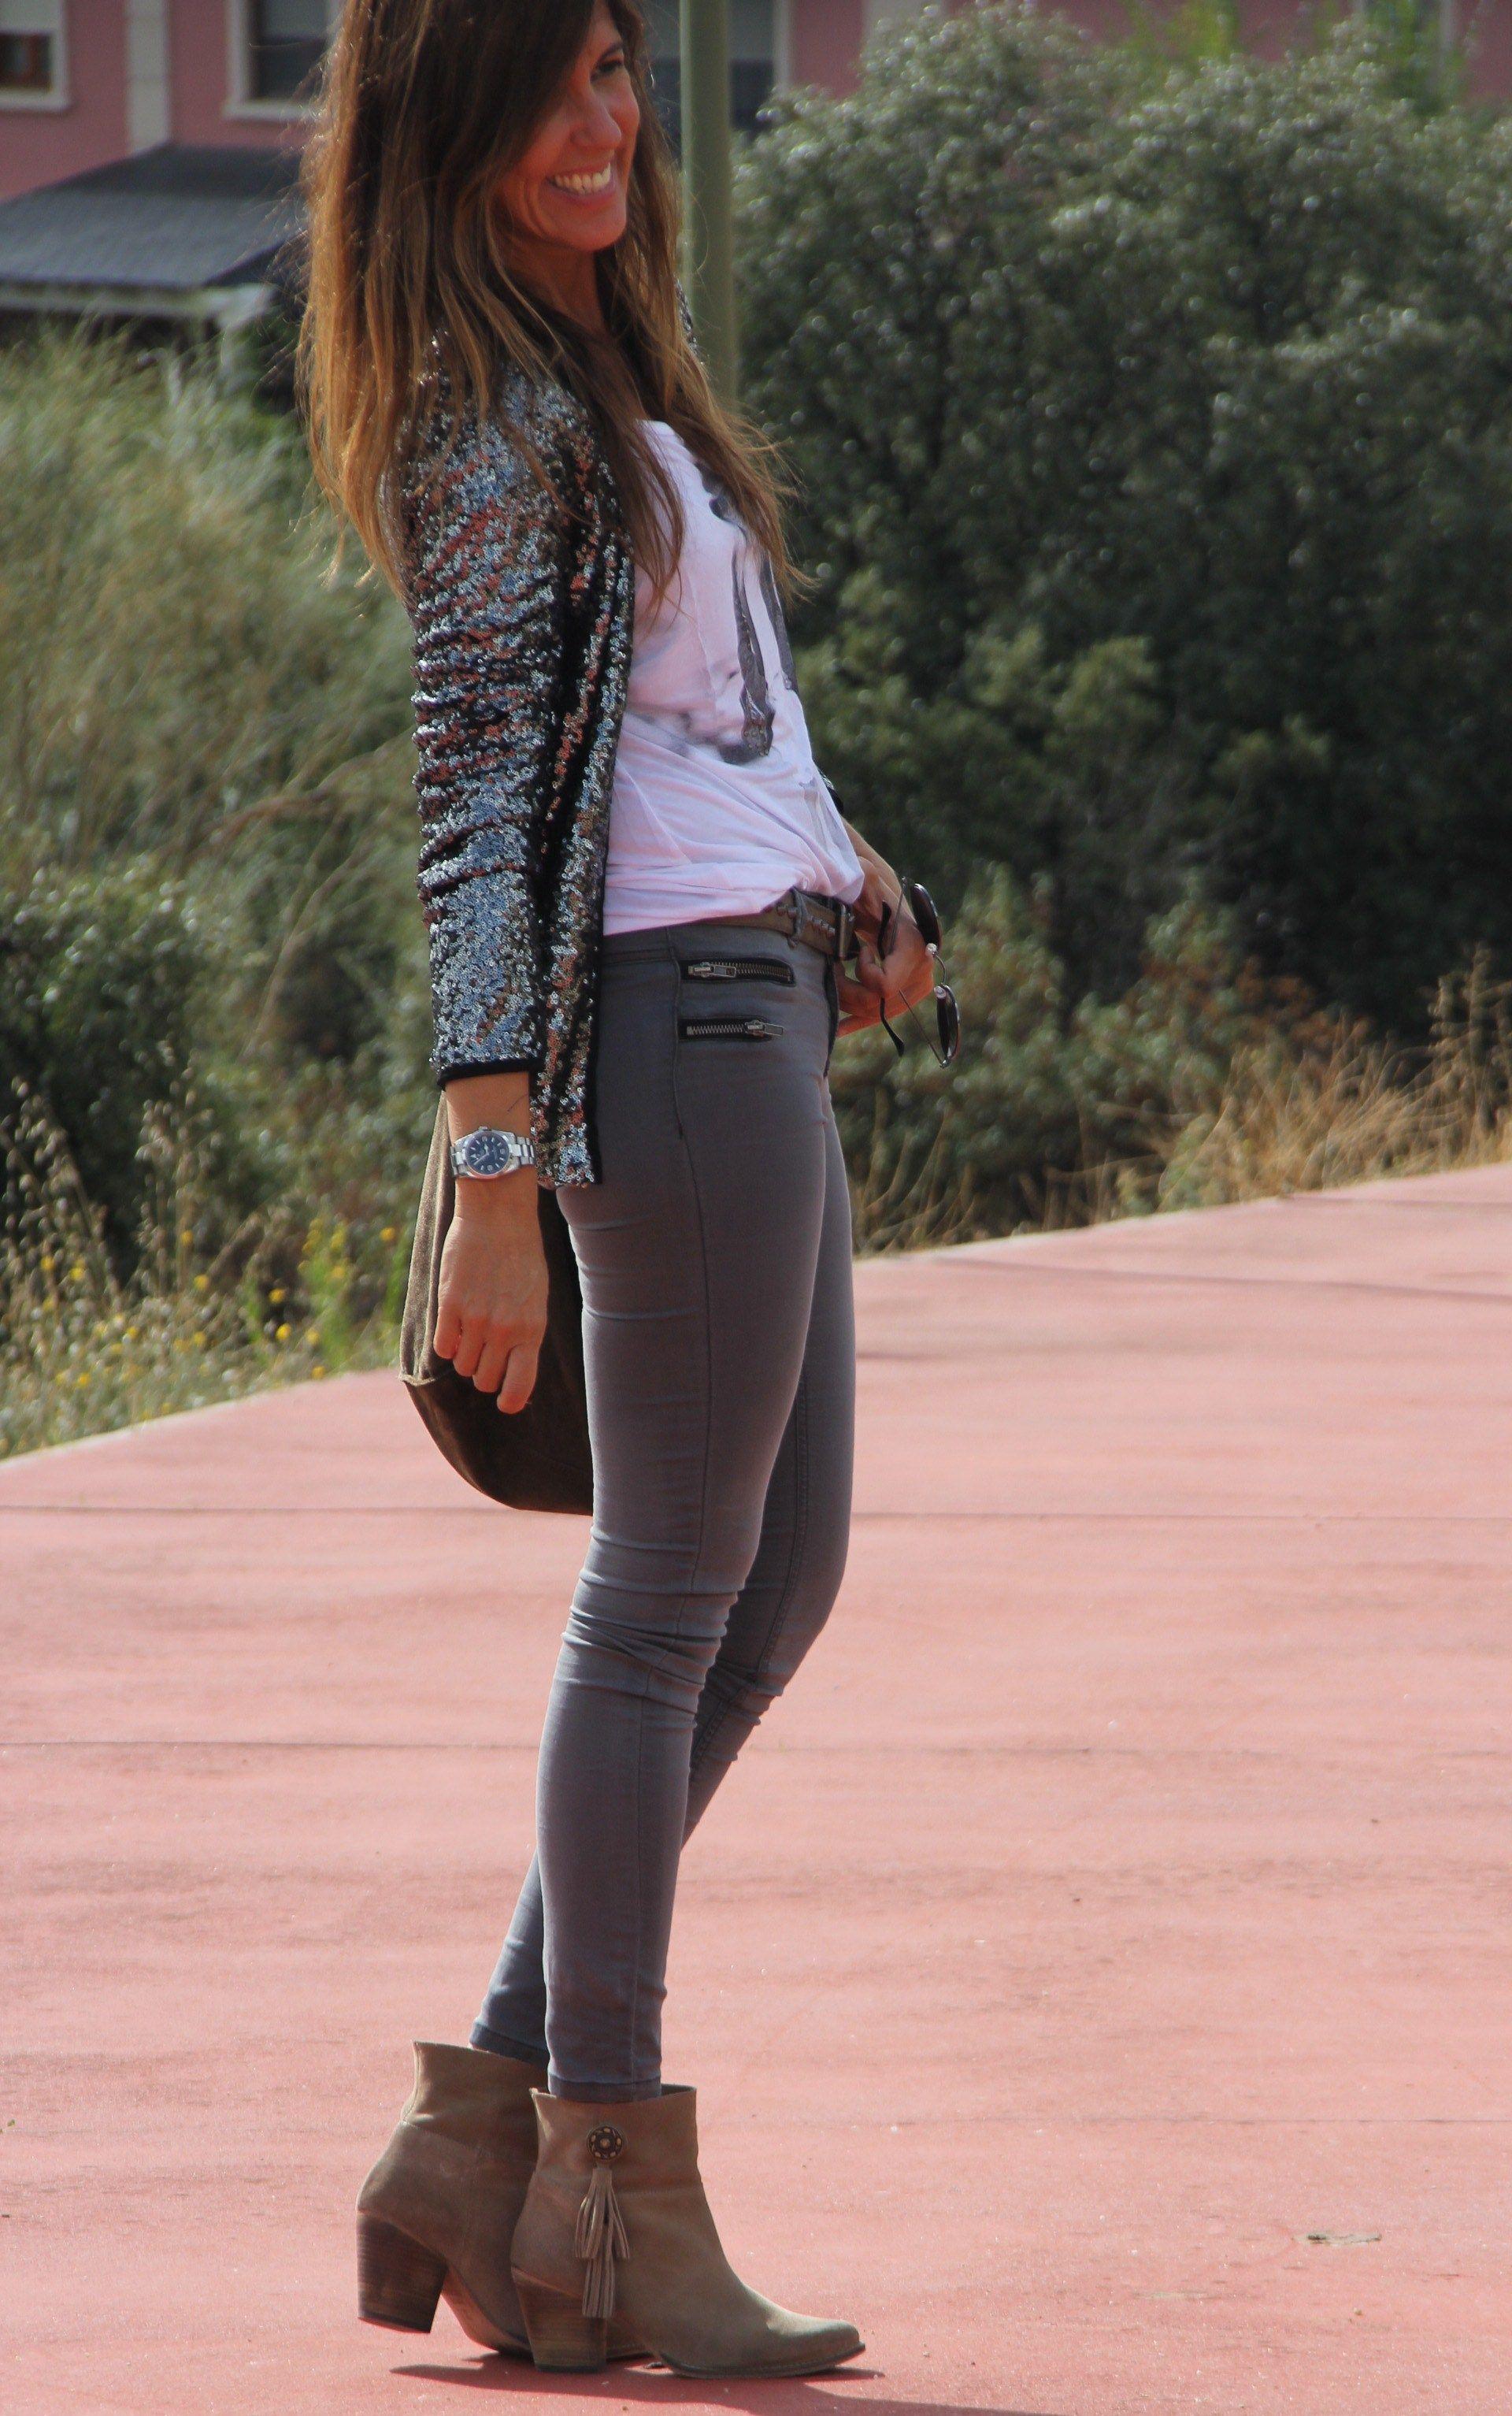 only for me | Vestir ropas, Invierno y Ropa